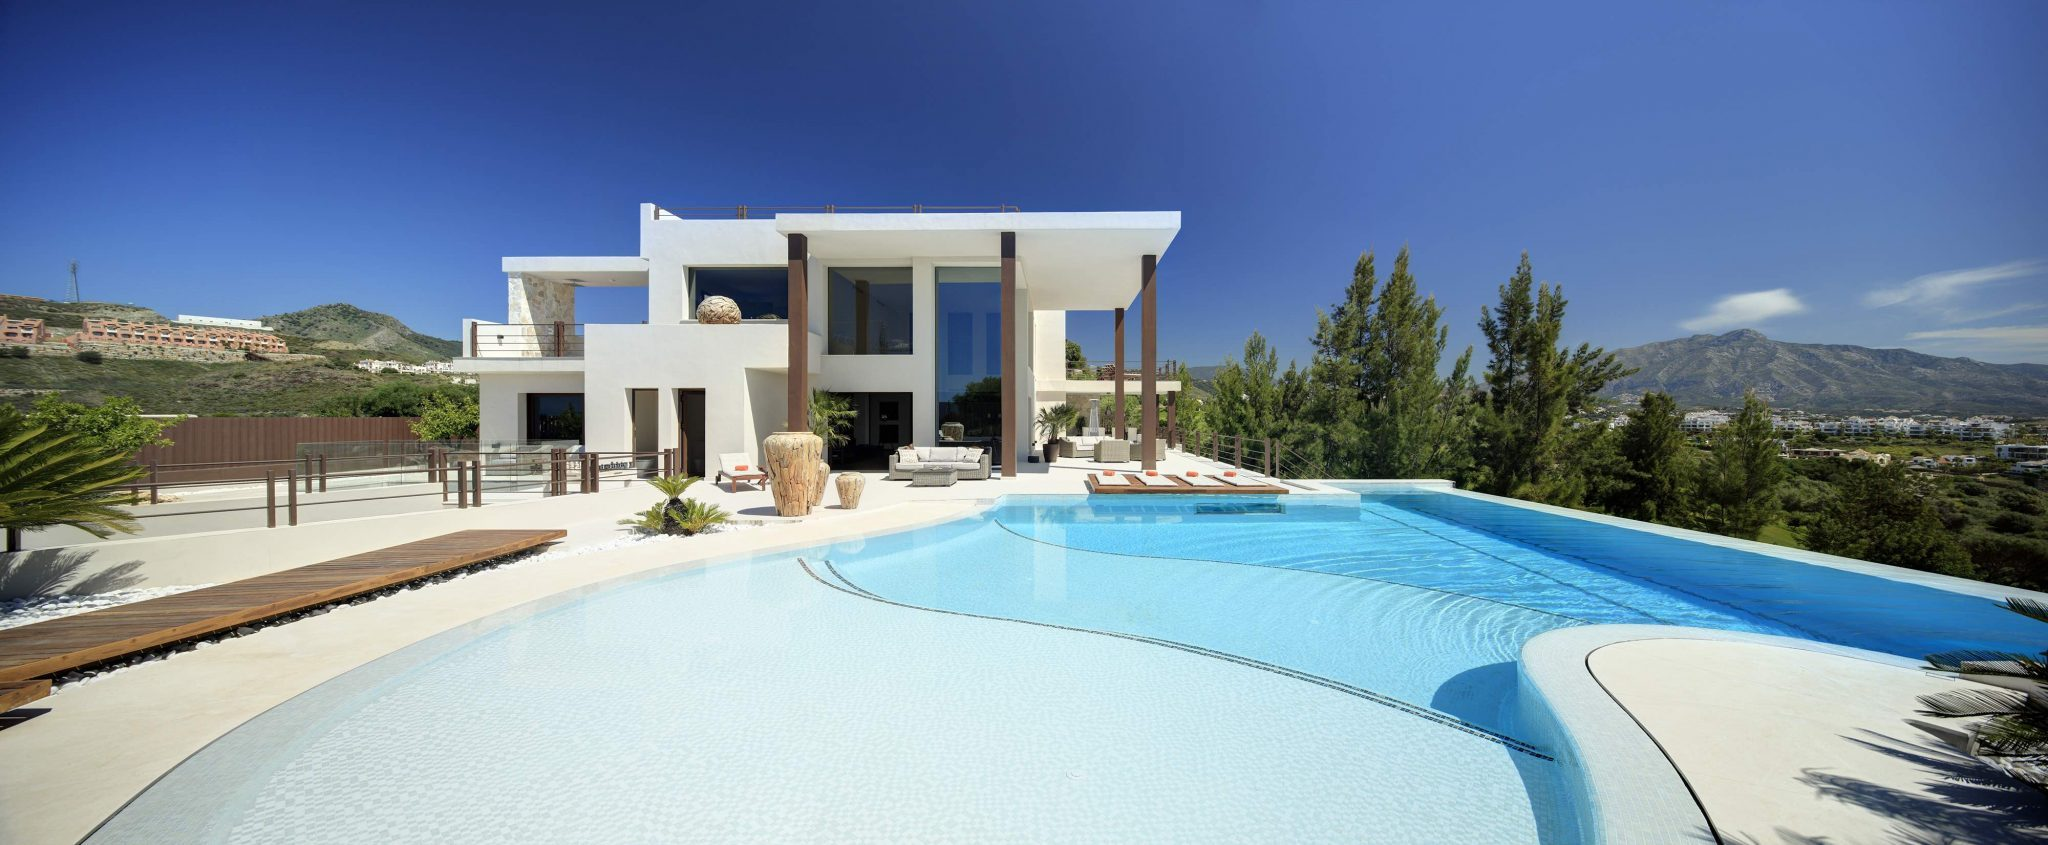 Stunning frontline golf villa with panoramic views